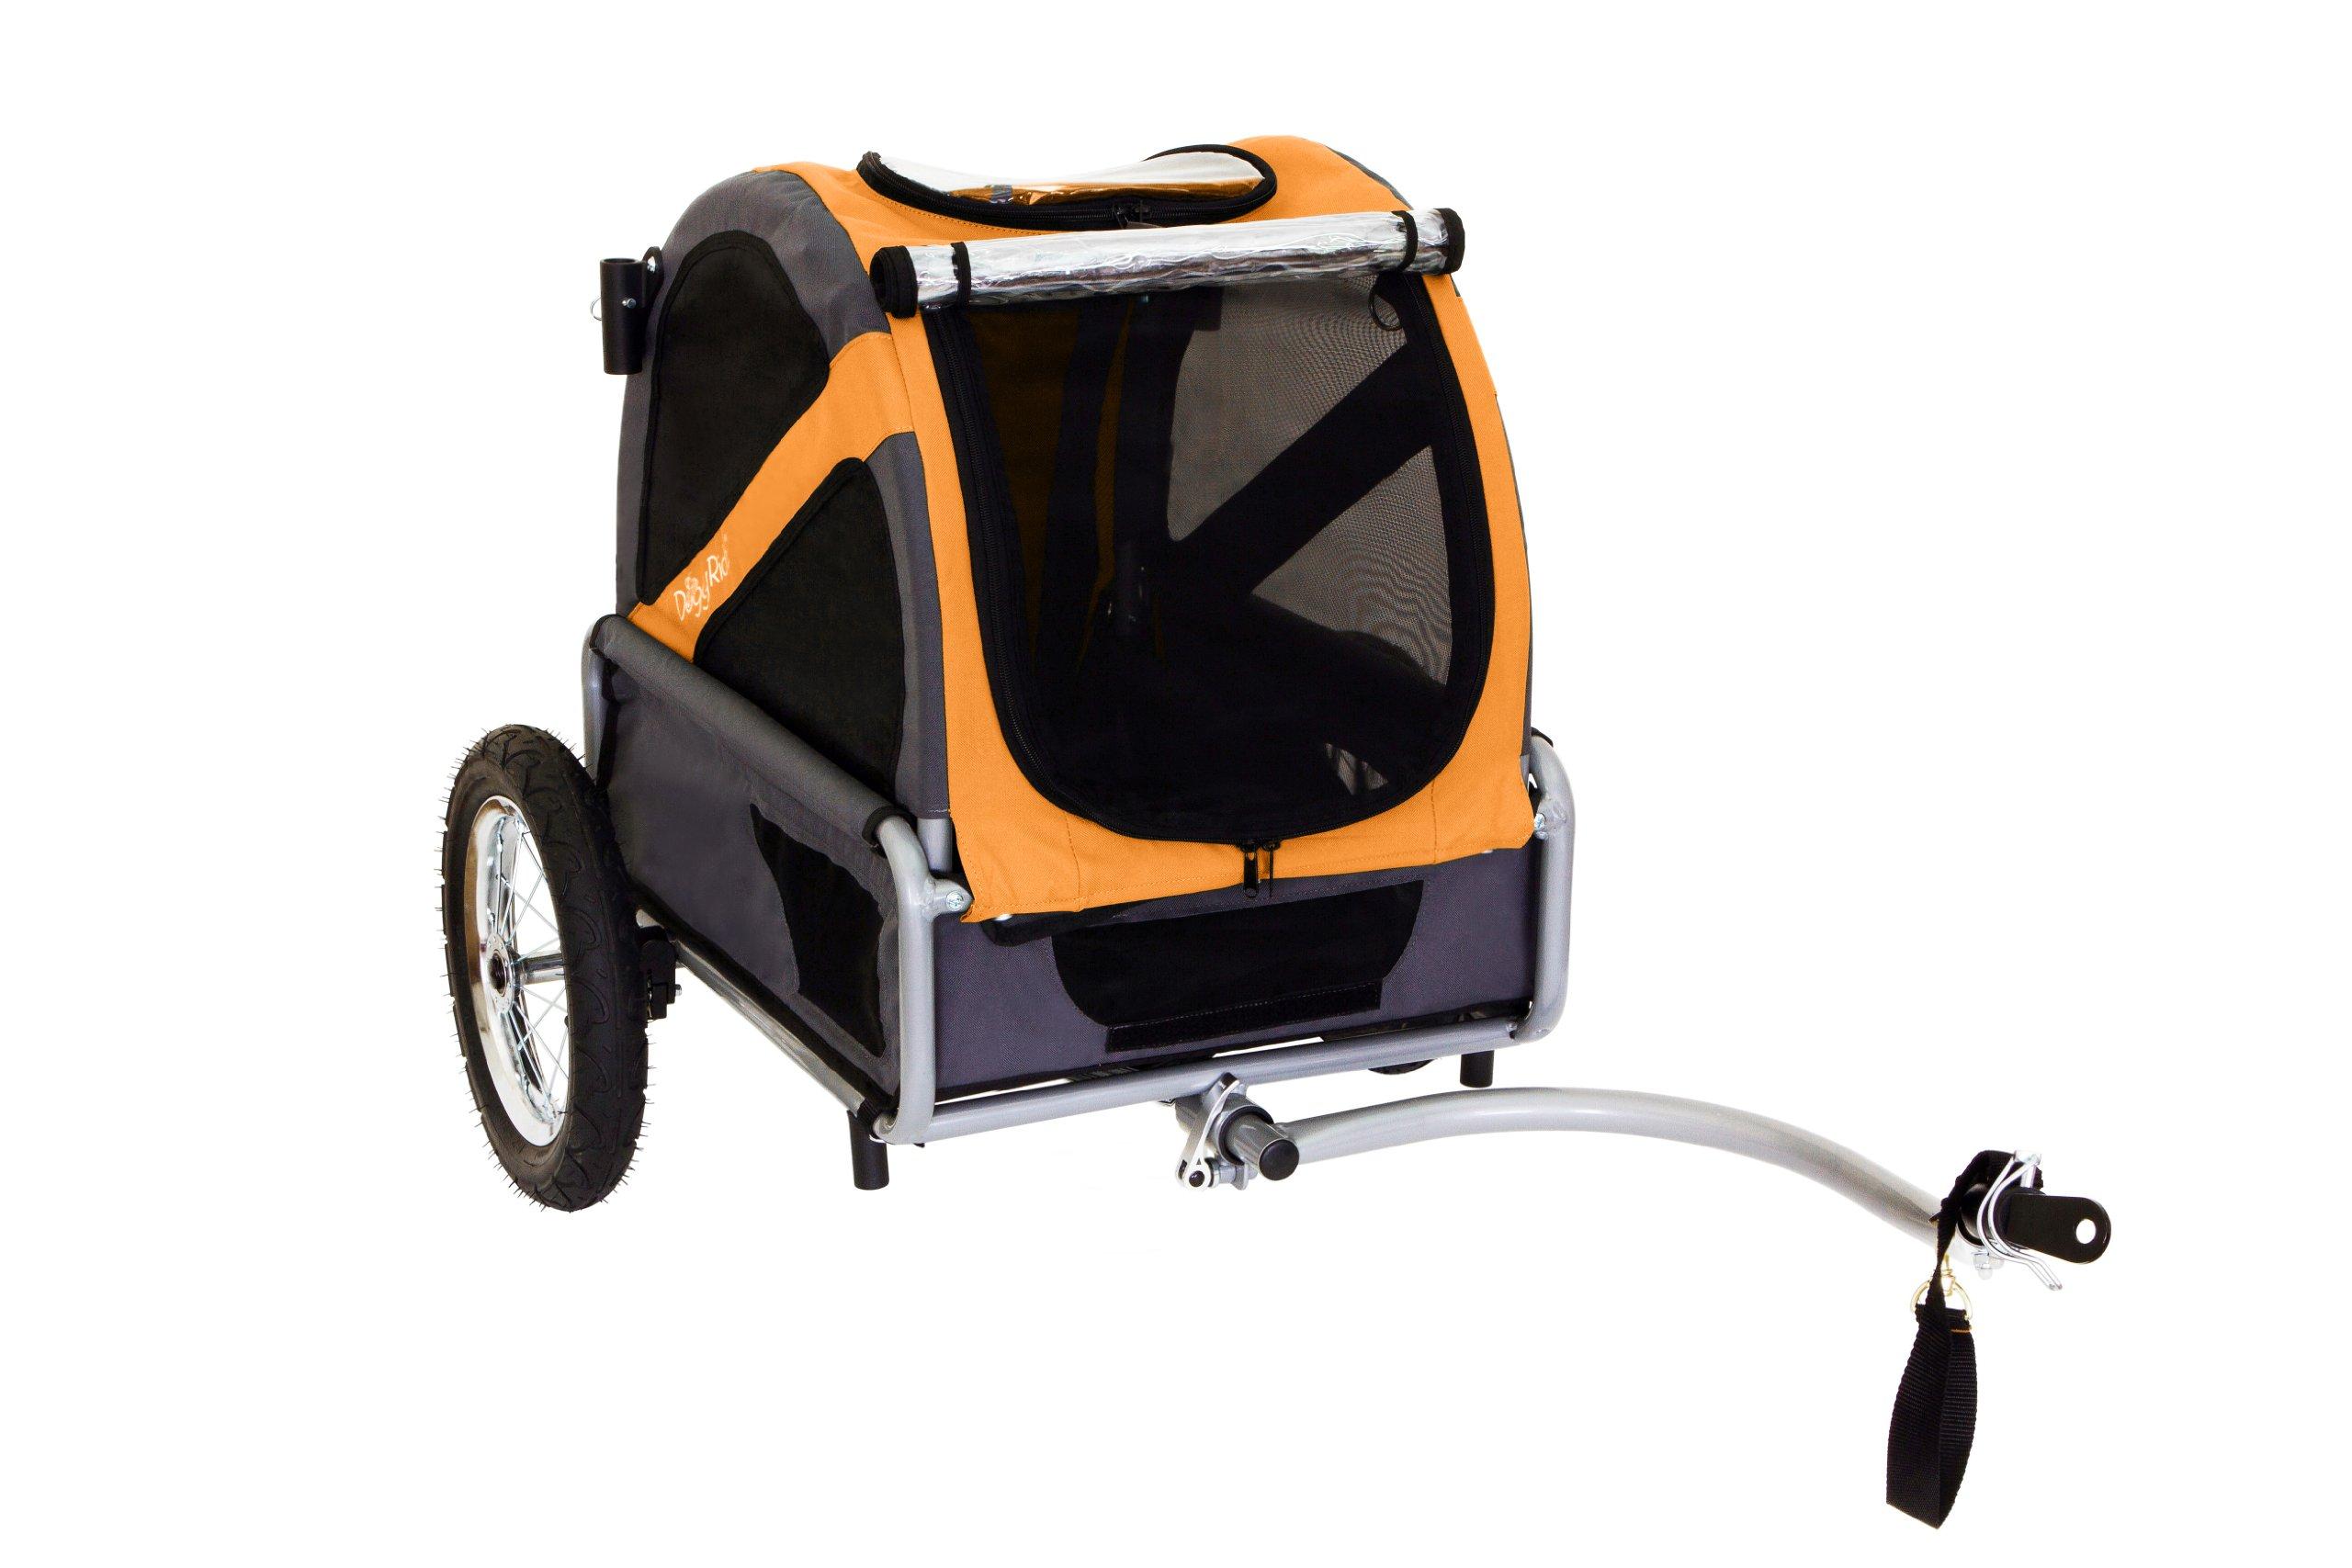 DoggyRide Bike Trailer for Dogs, Mini, Dutch Orange/Grey by DoggyRide